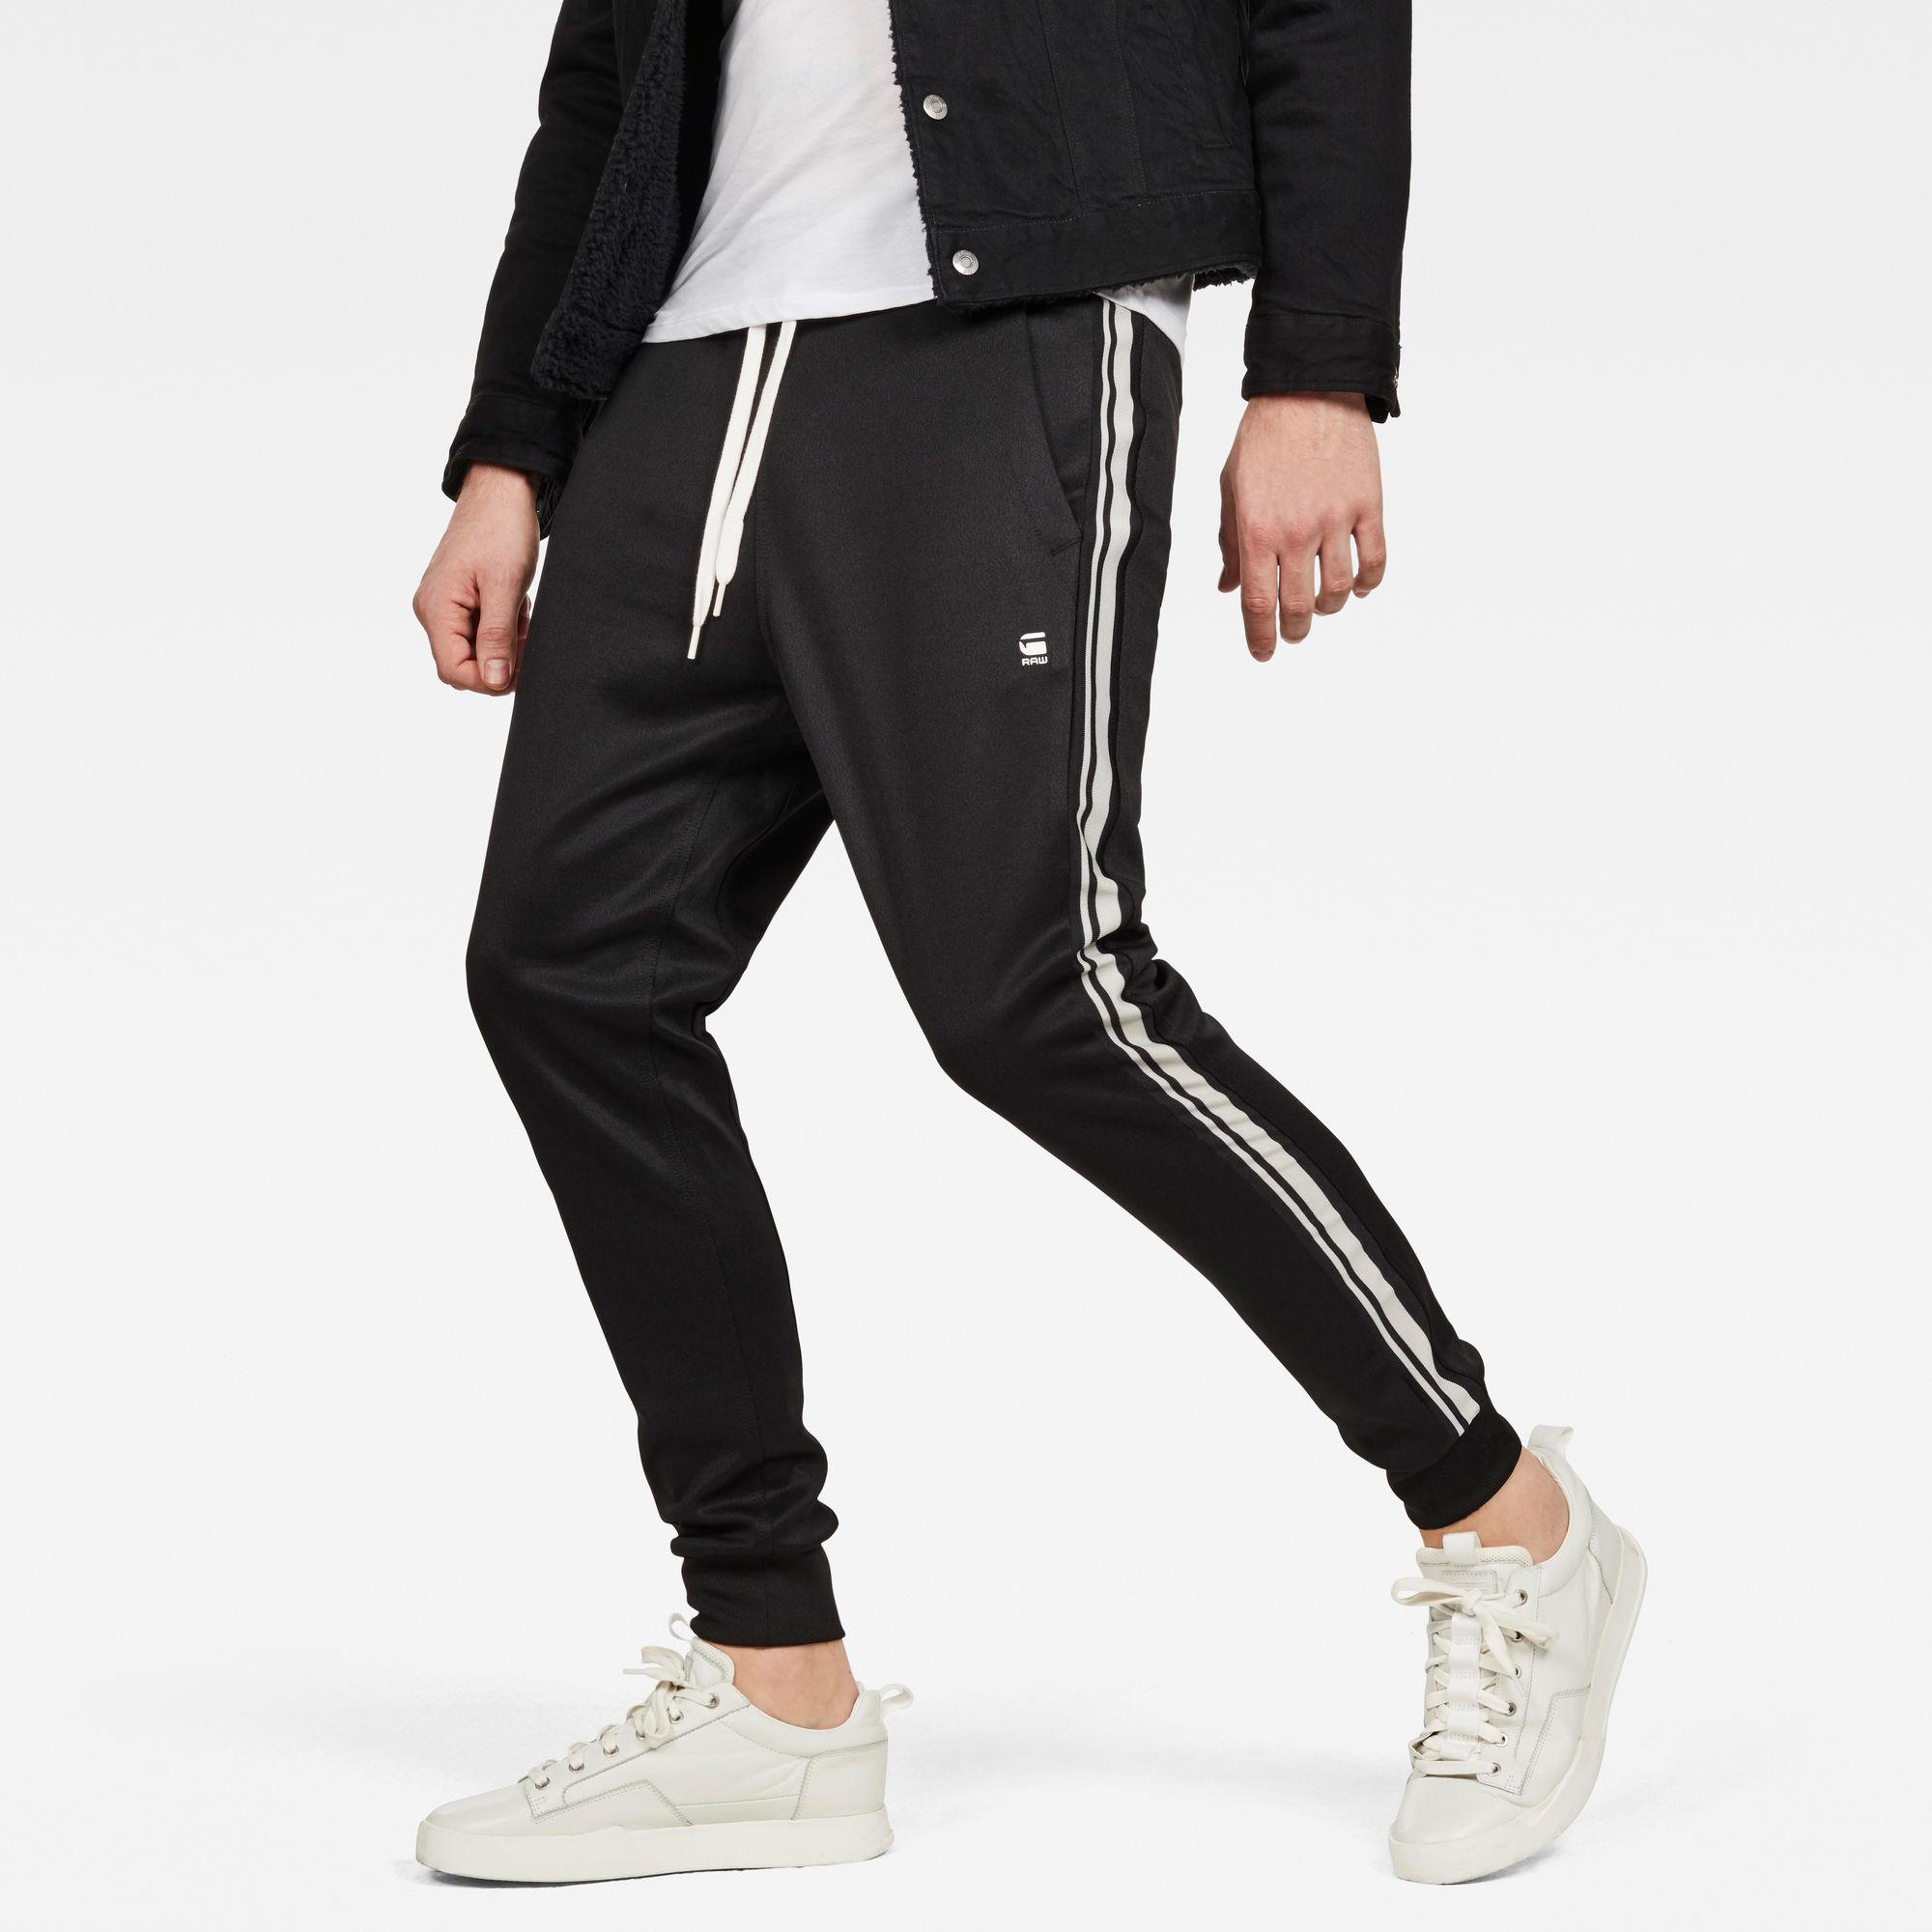 Image of G Star Raw Alchesai Slim Tapered Sweatpants